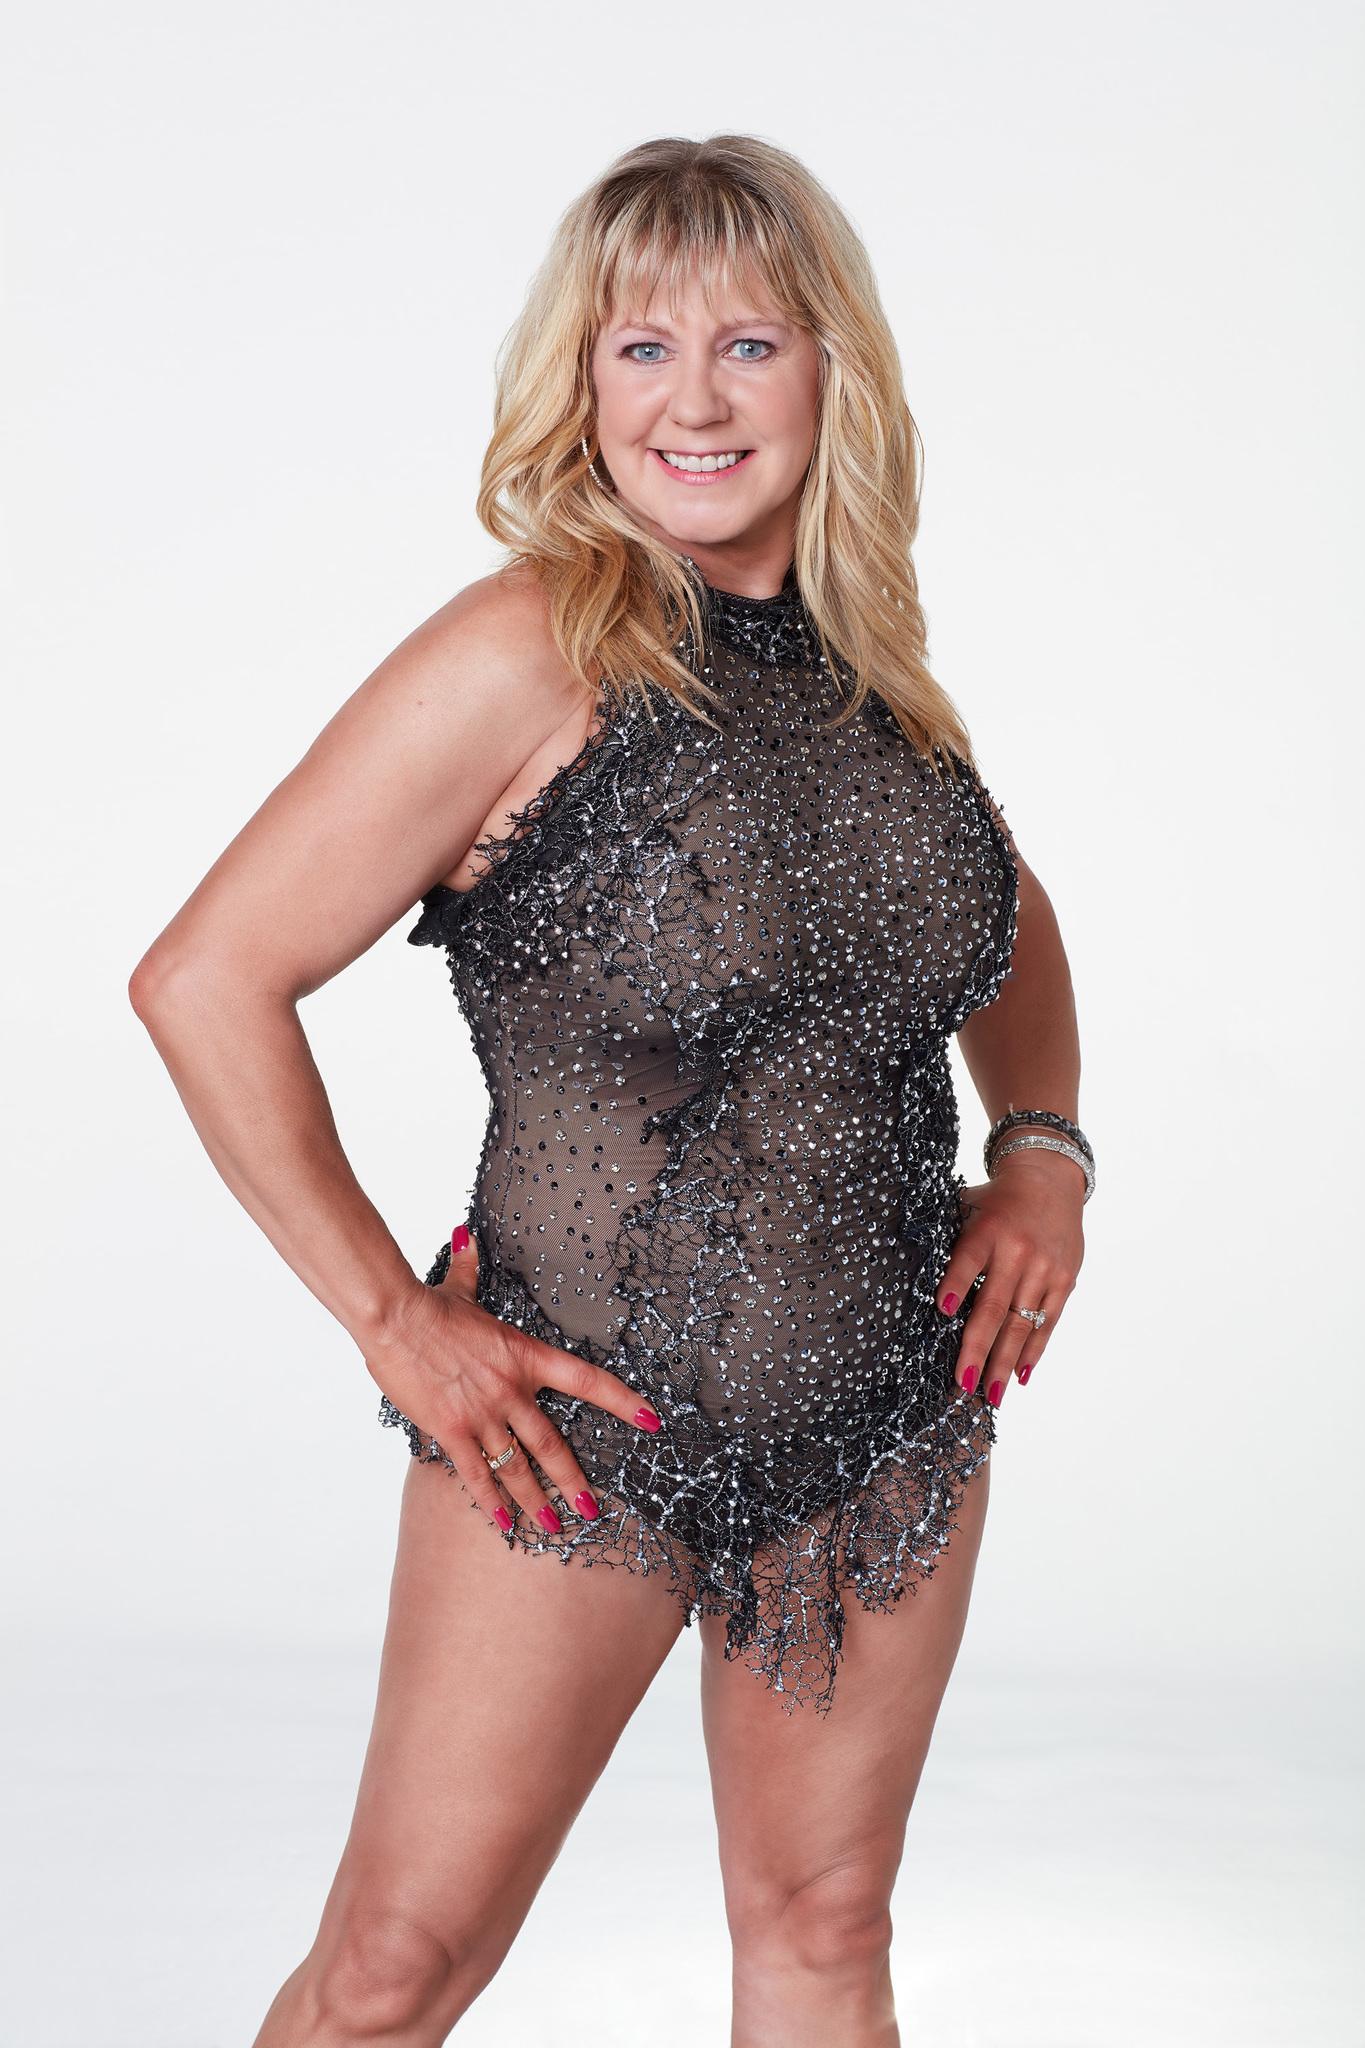 Tonya Harding in Dancing with the Stars (2005)